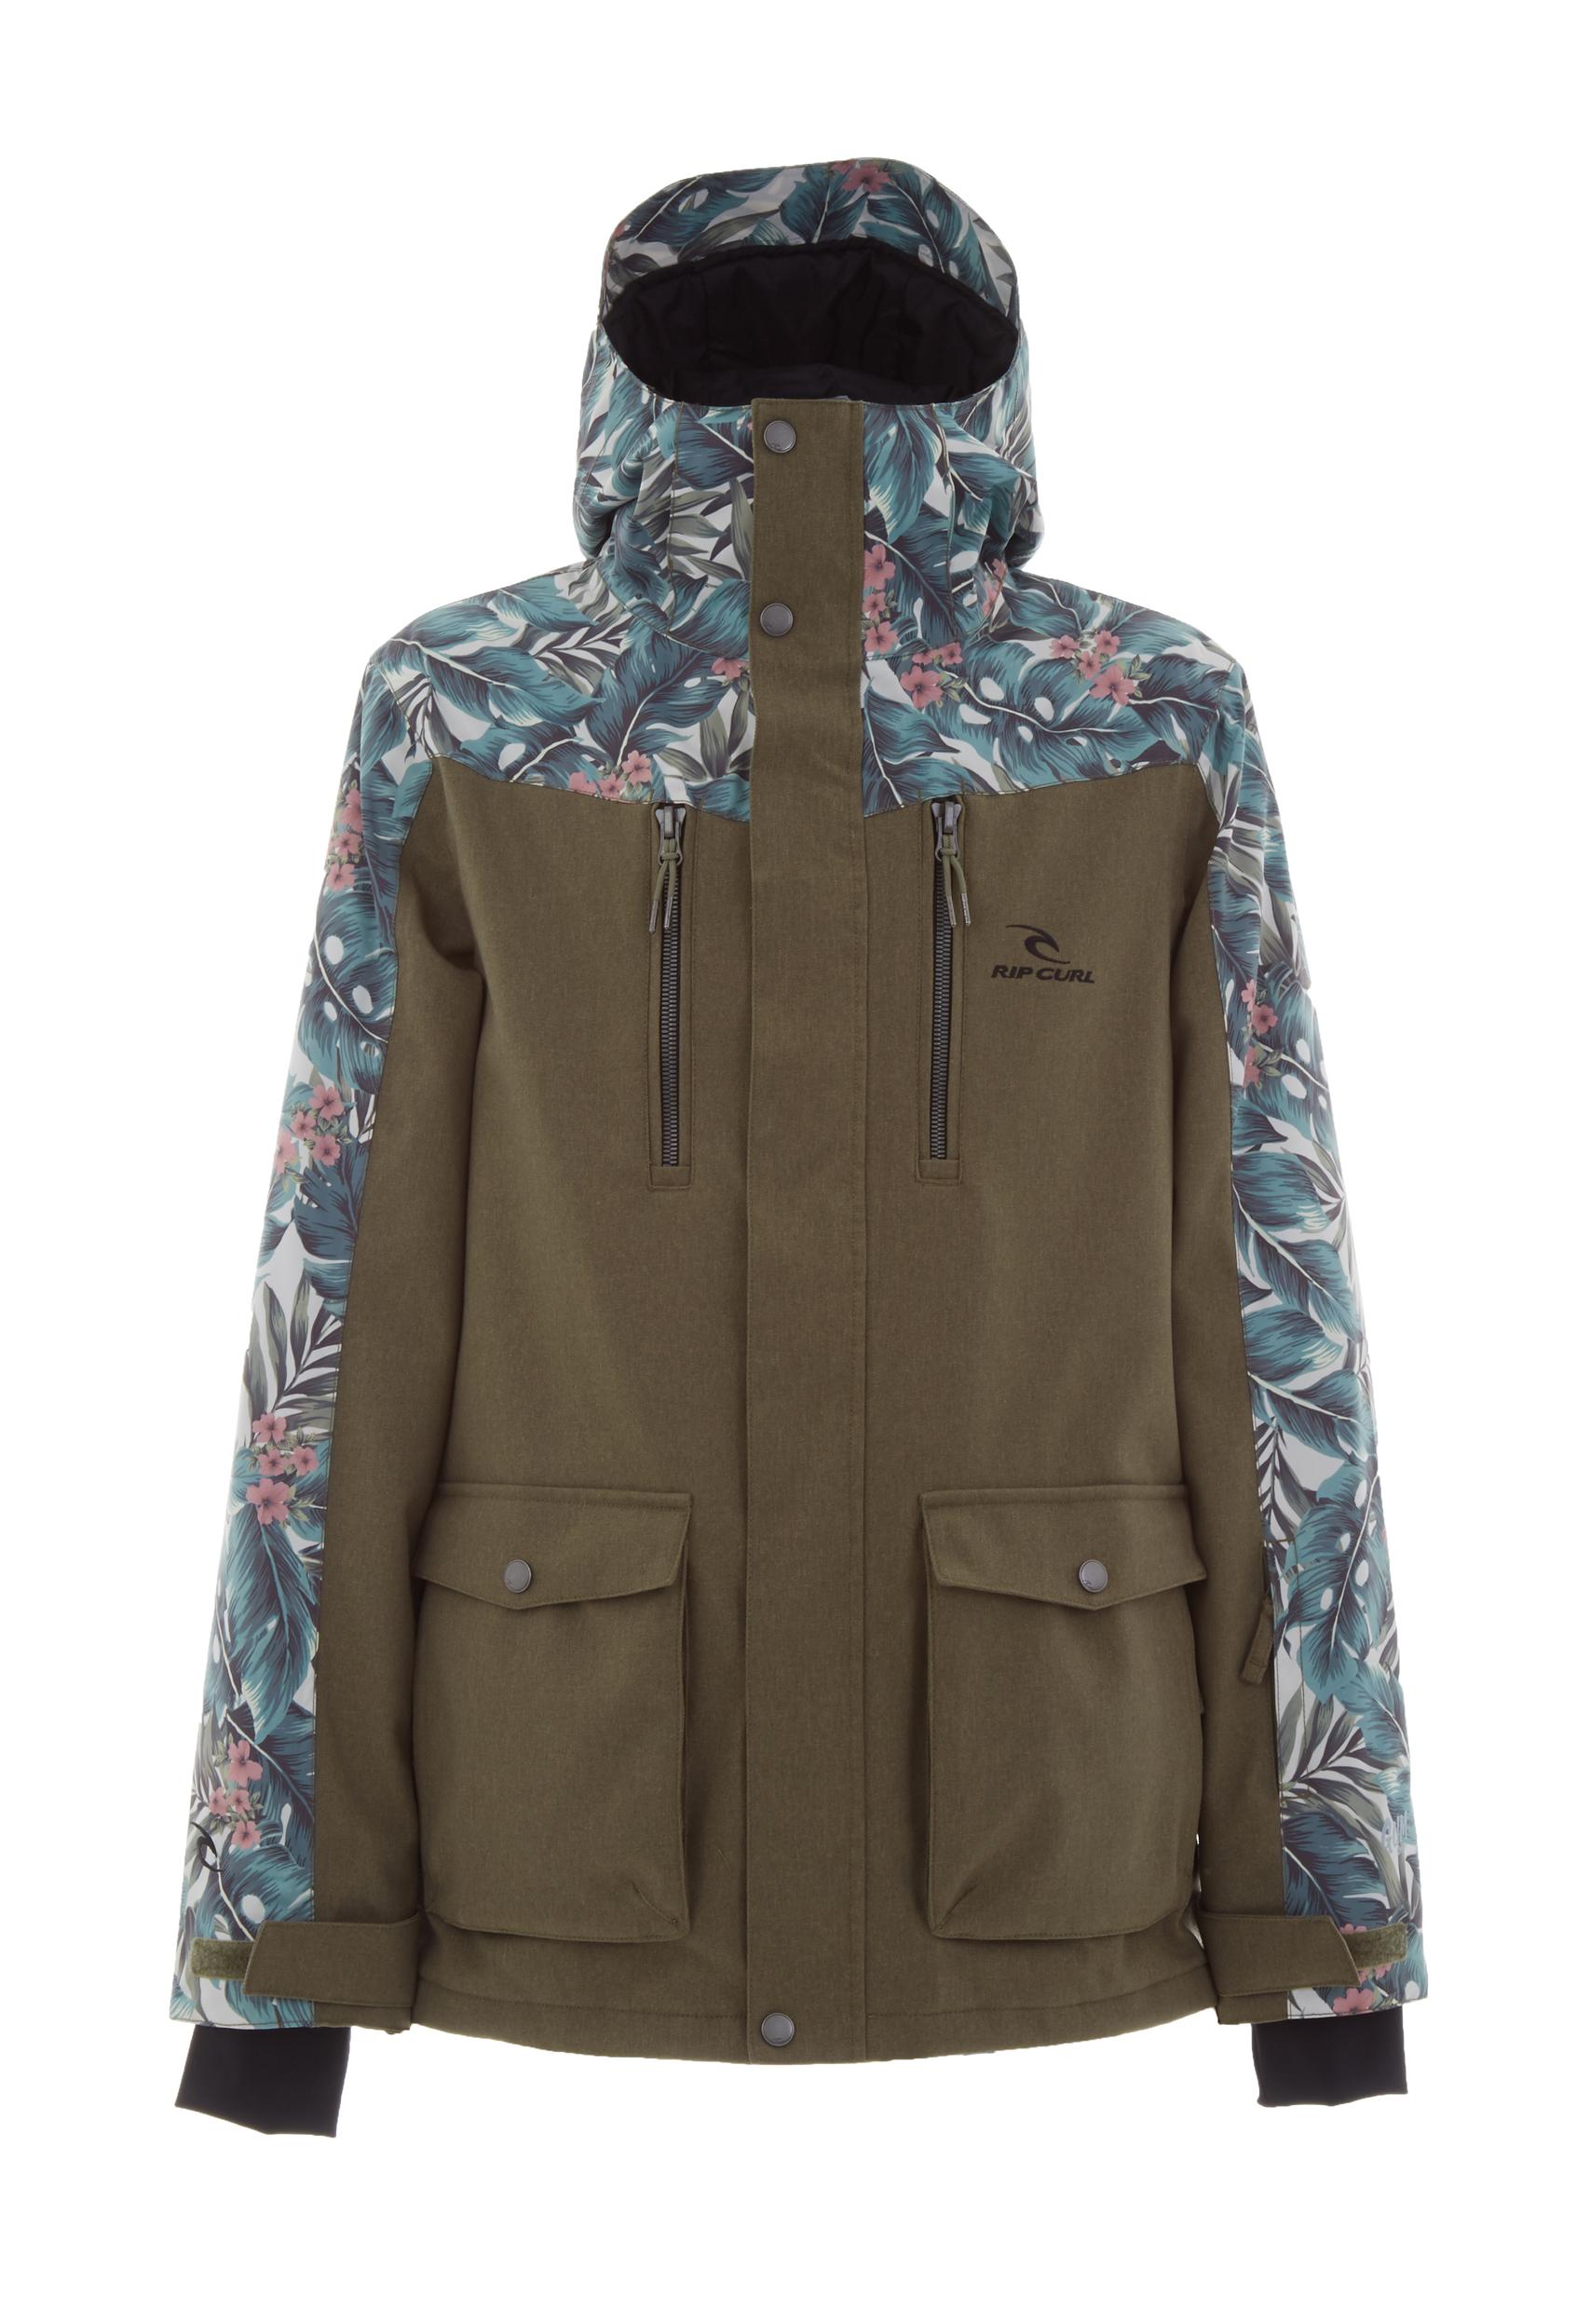 The Cabin Gum Jacket